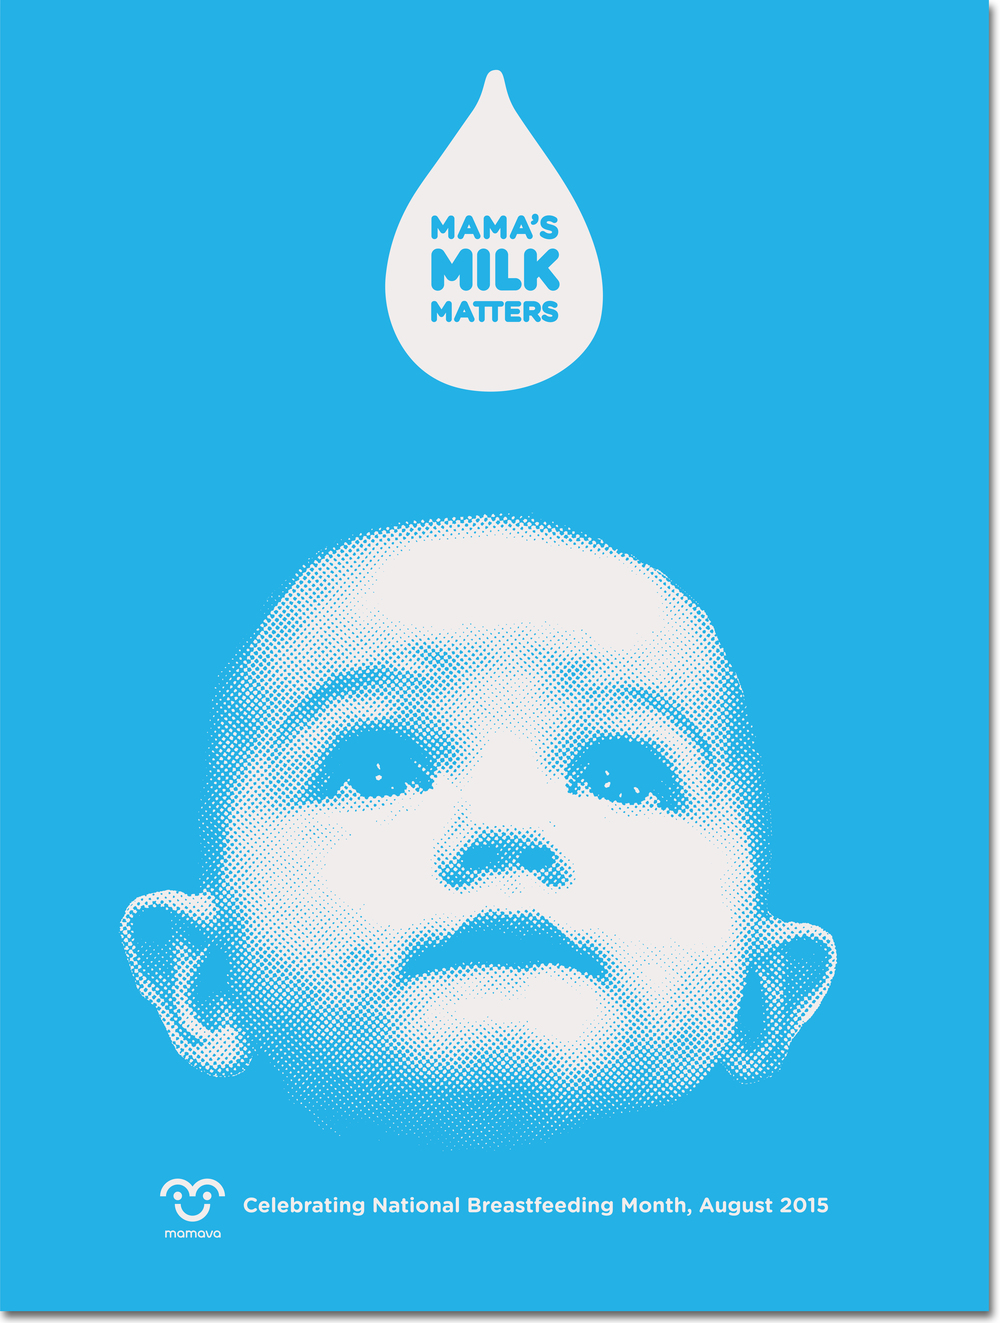 Mama's-Milk-Matters-Poster